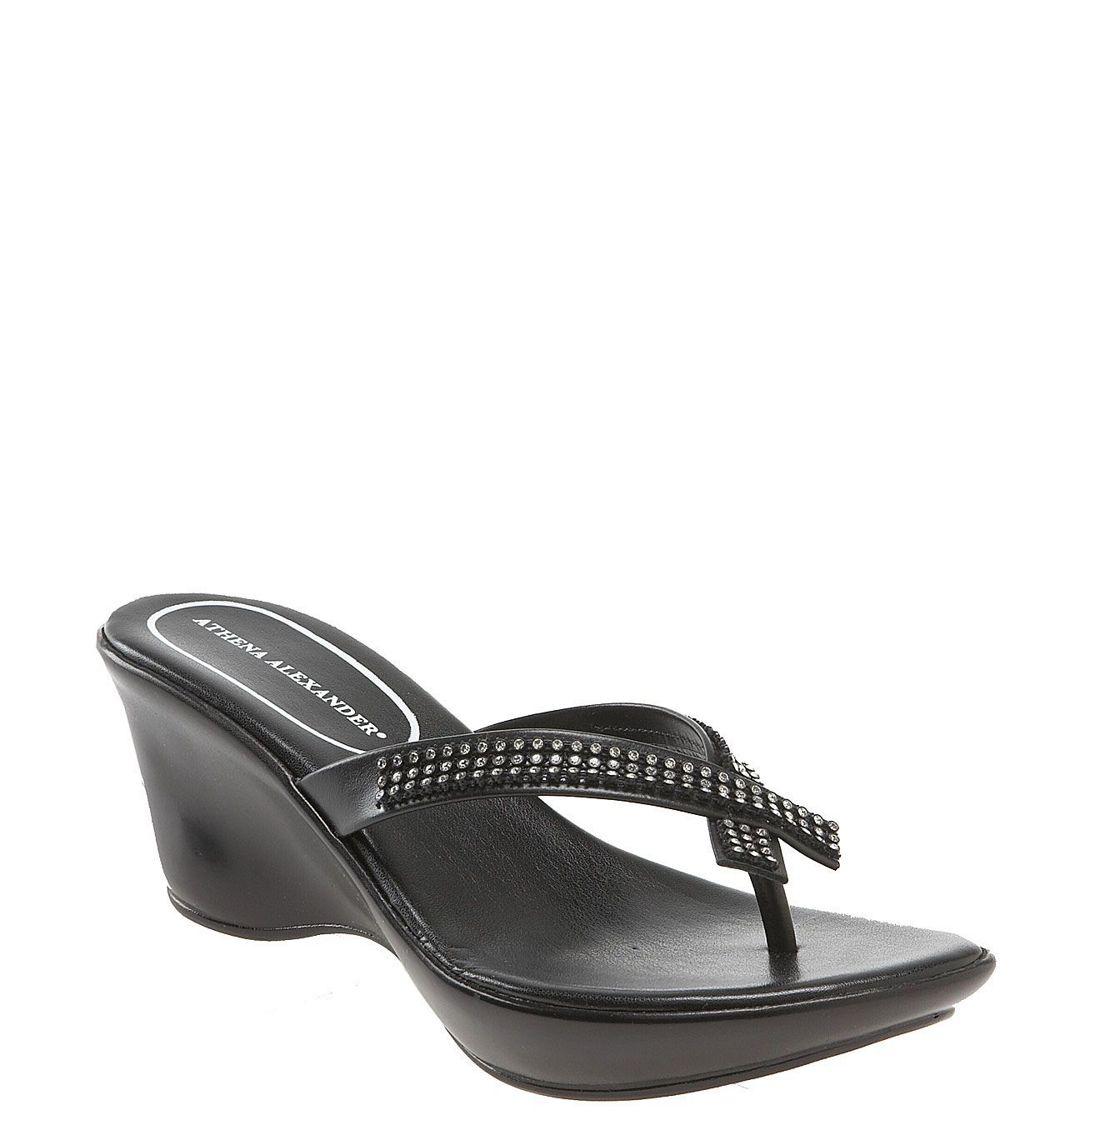 Athena Alexander Womens Roxi Sandal In Black Lyst